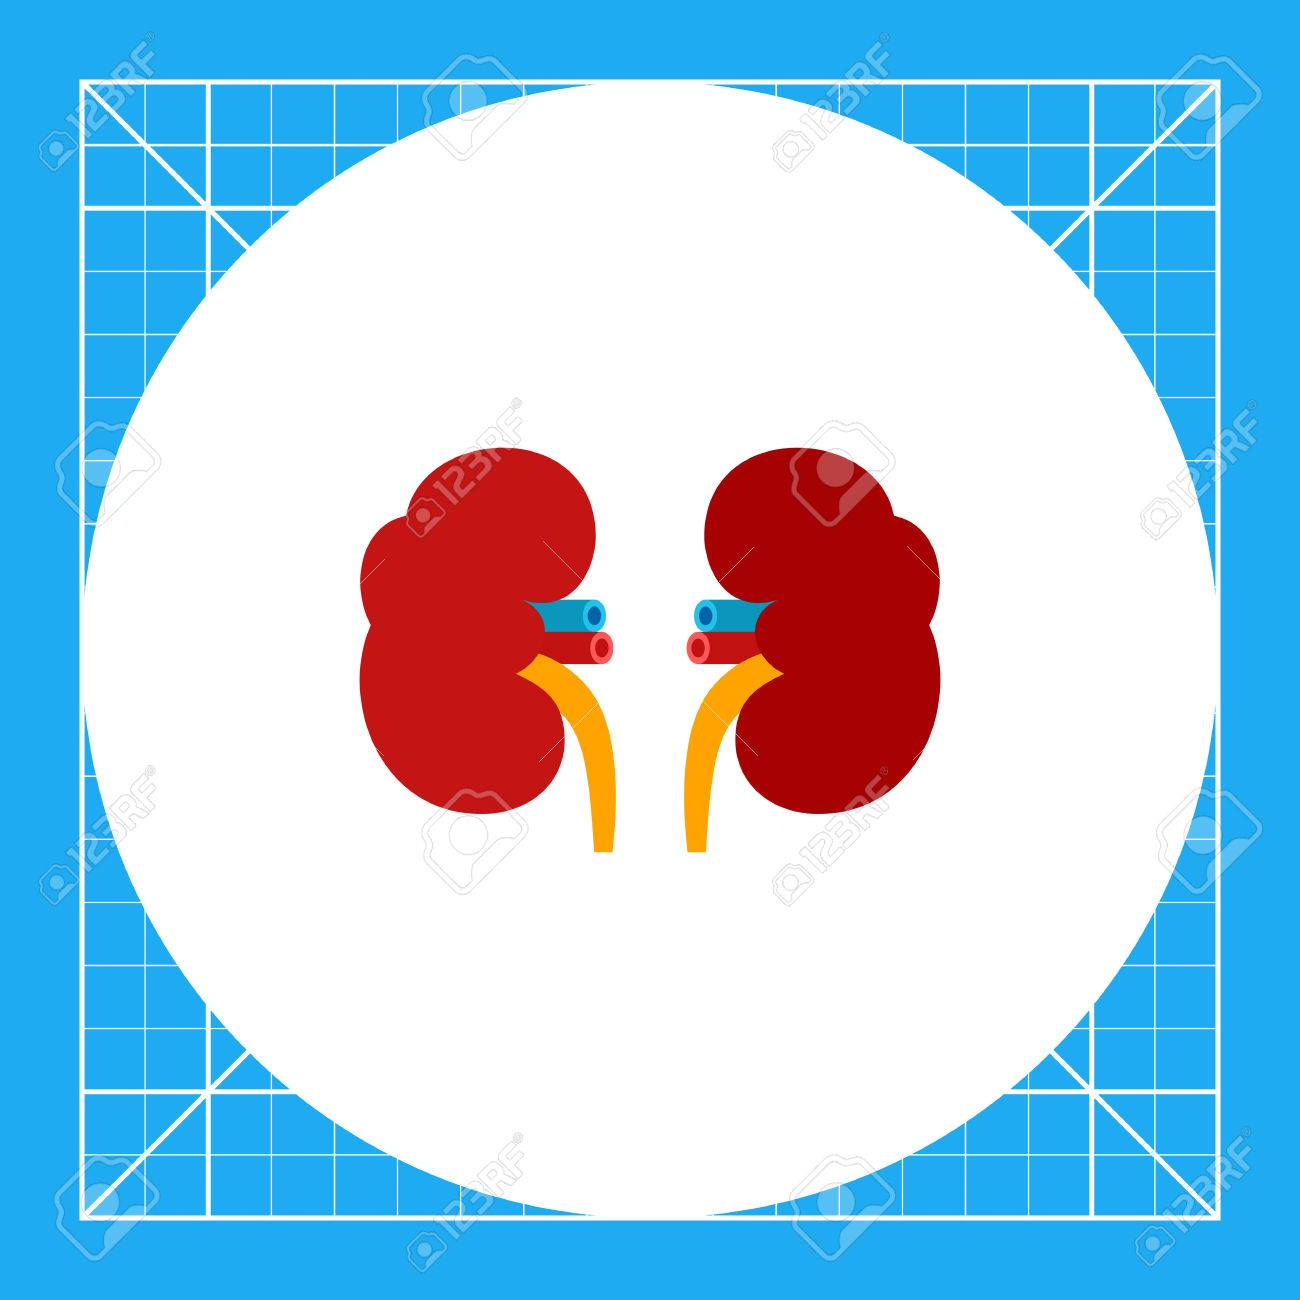 Kidneys Illustration. Human Internal Organ, Health Care, Anatomy ...